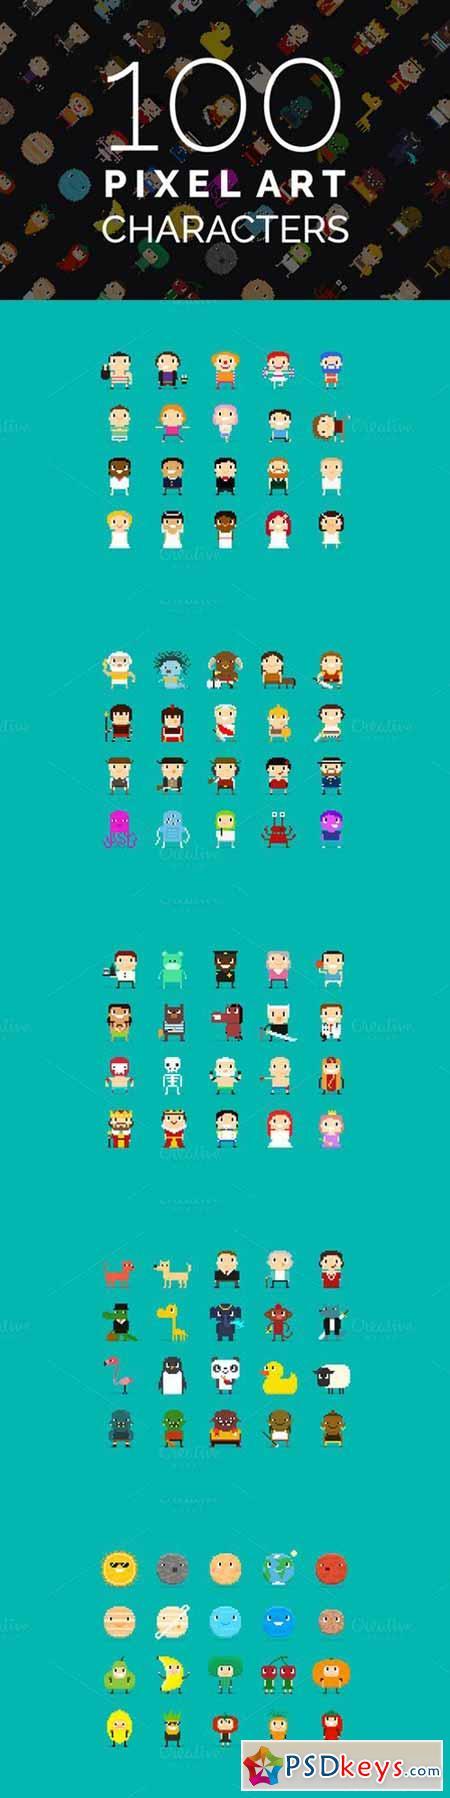 100 Pixel Art Characters - 2 590338